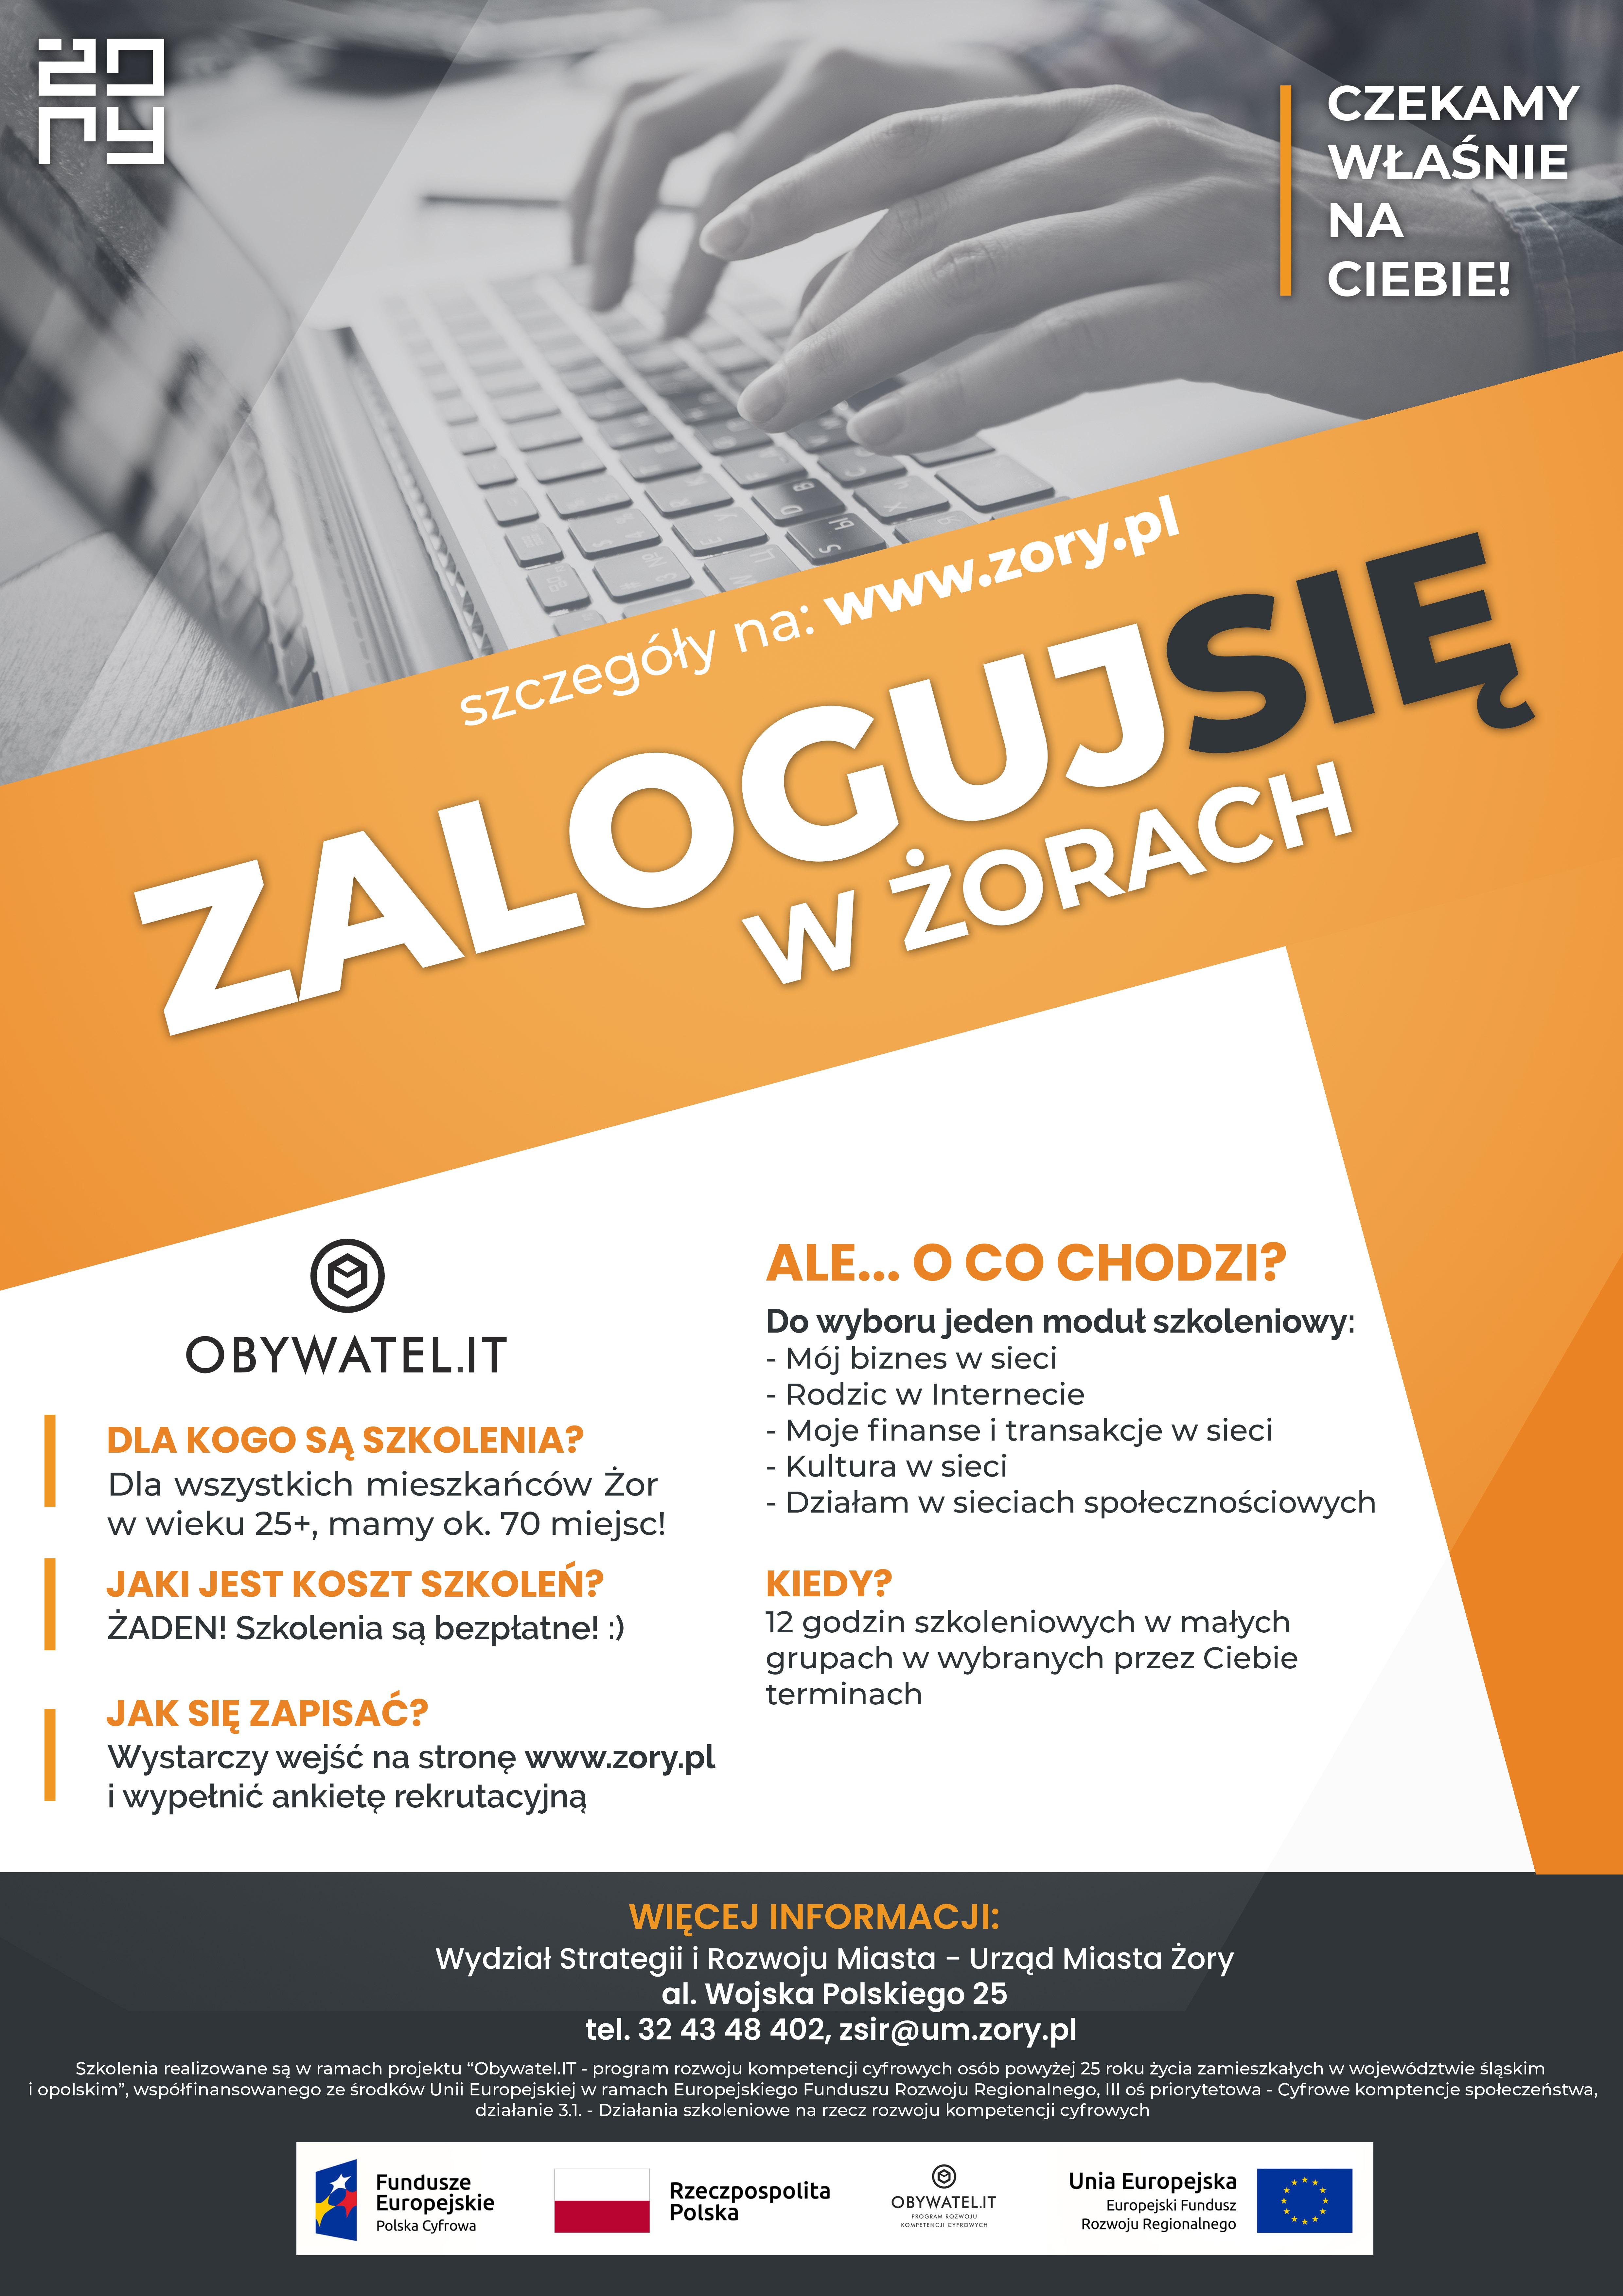 http://sp1.szkola.pl/wp-content/uploads/2019/01/Plakat-Zaloguj-si%C4%99-w-%C5%BBorach.jpg